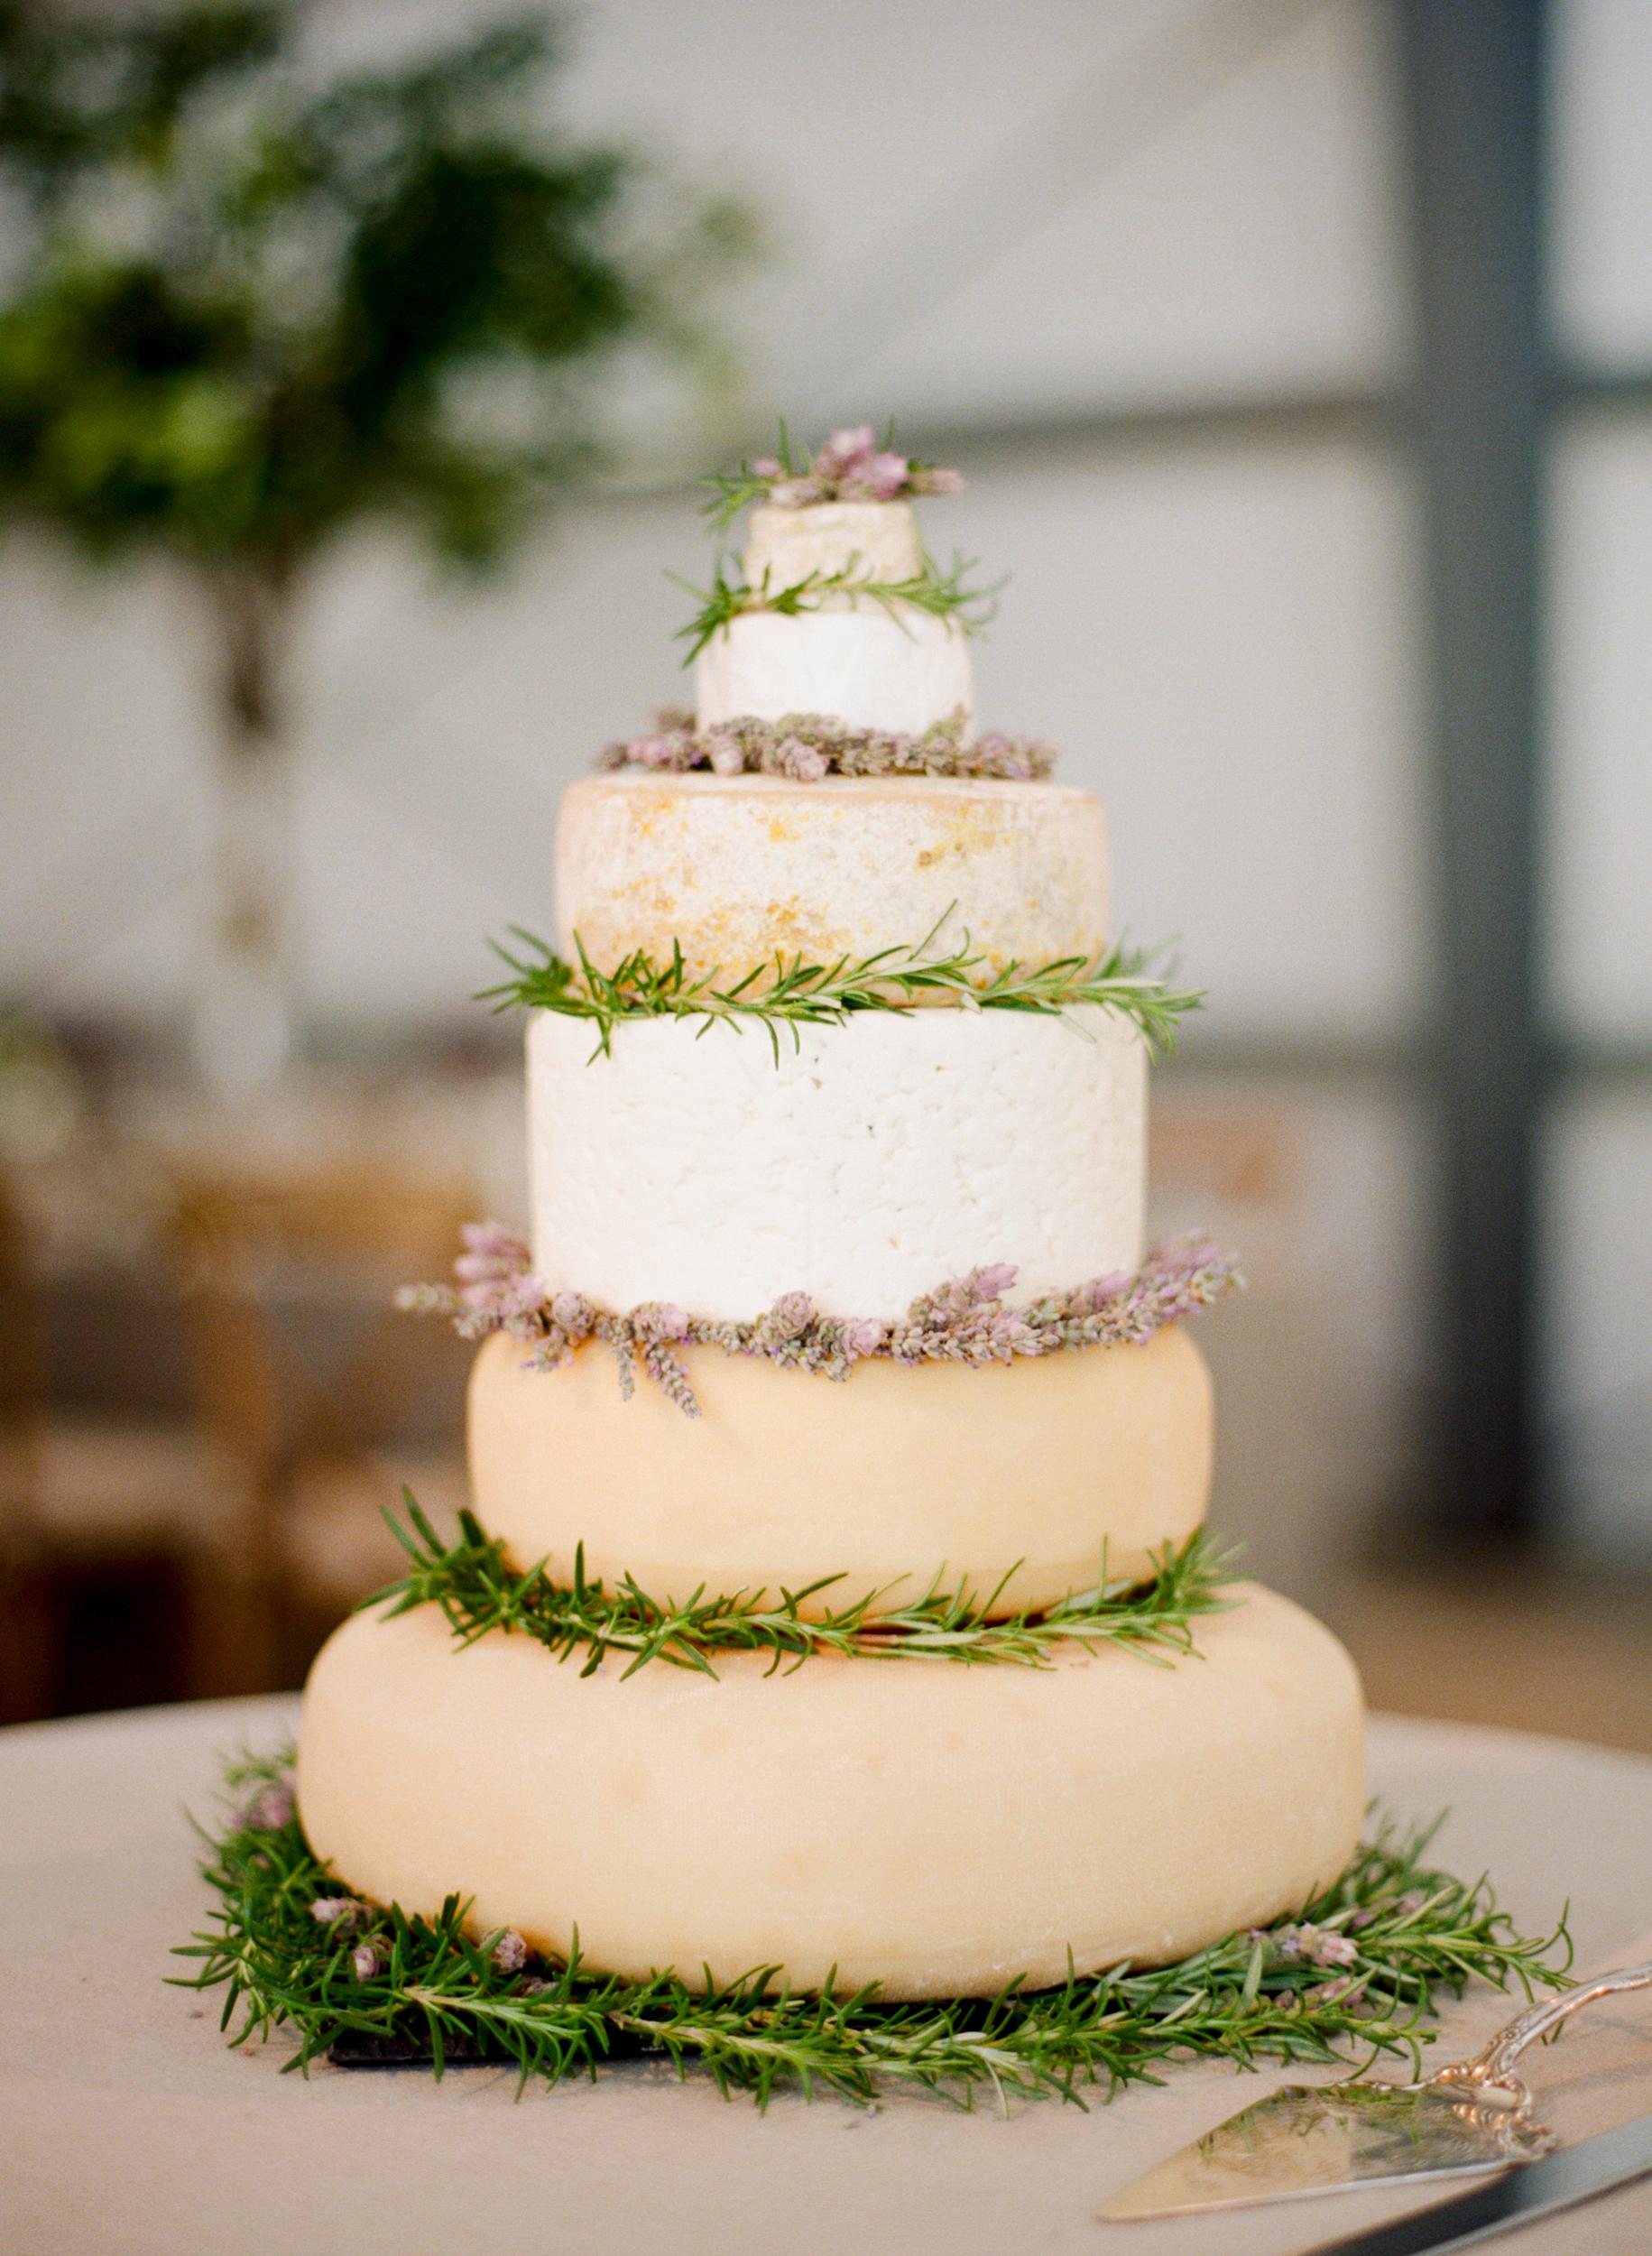 SylvieGil-Durham-Ranch-Organic-Ethereal-Rustic-Olive-Cheese-Cake-Wedding